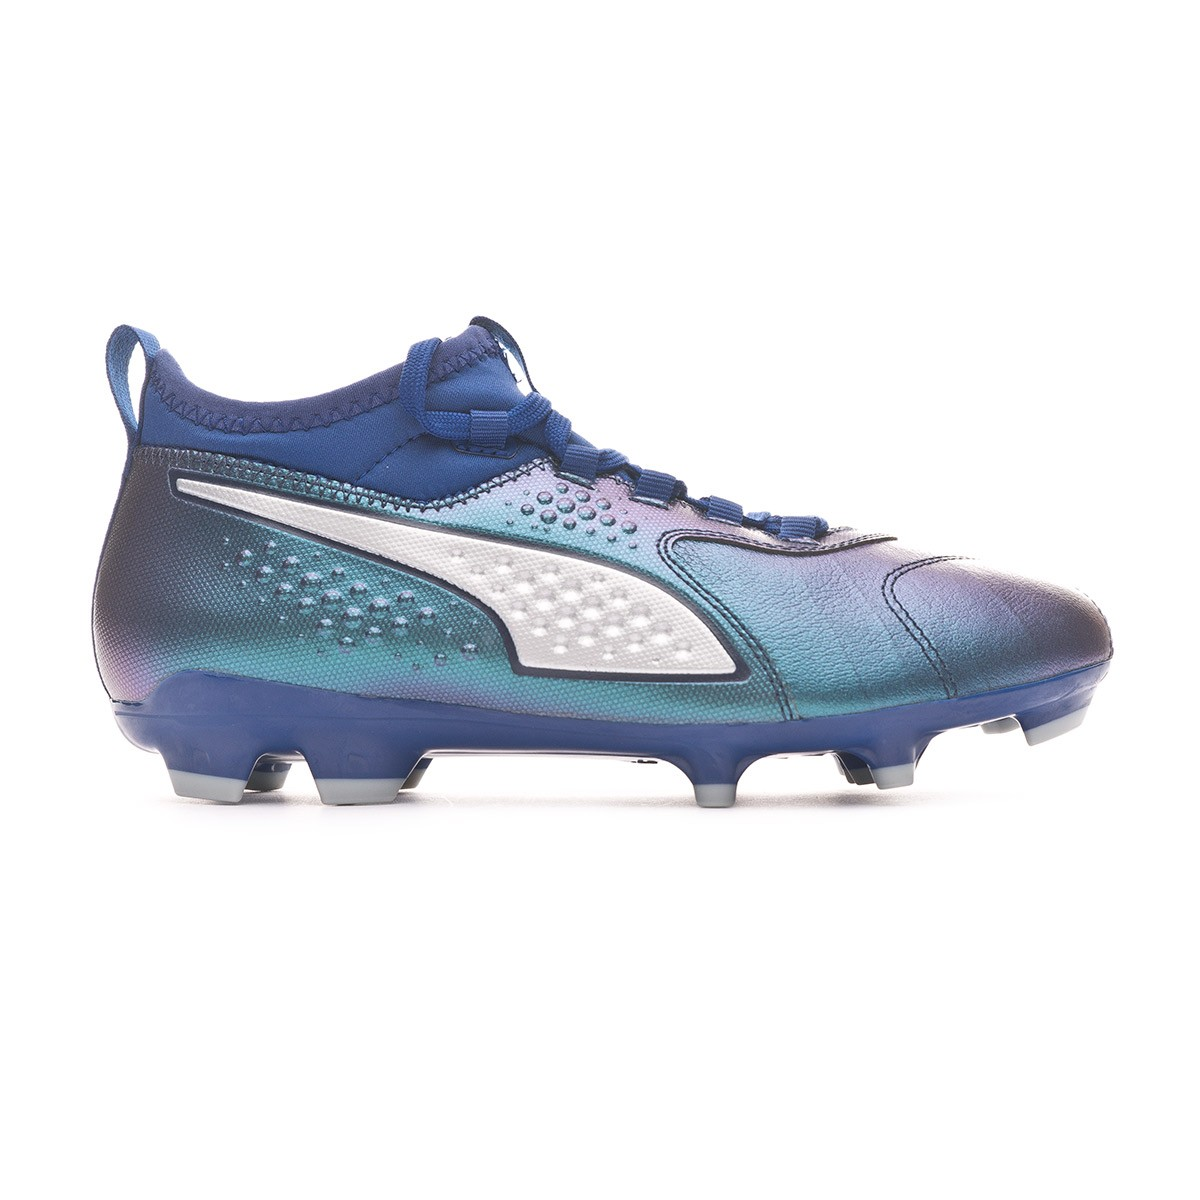 0d159b54d29 Football Boots Puma Kids Puma One 3 Leather FG Sodalite Blue-Vibrant Yellow  - Football store Fútbol Emotion